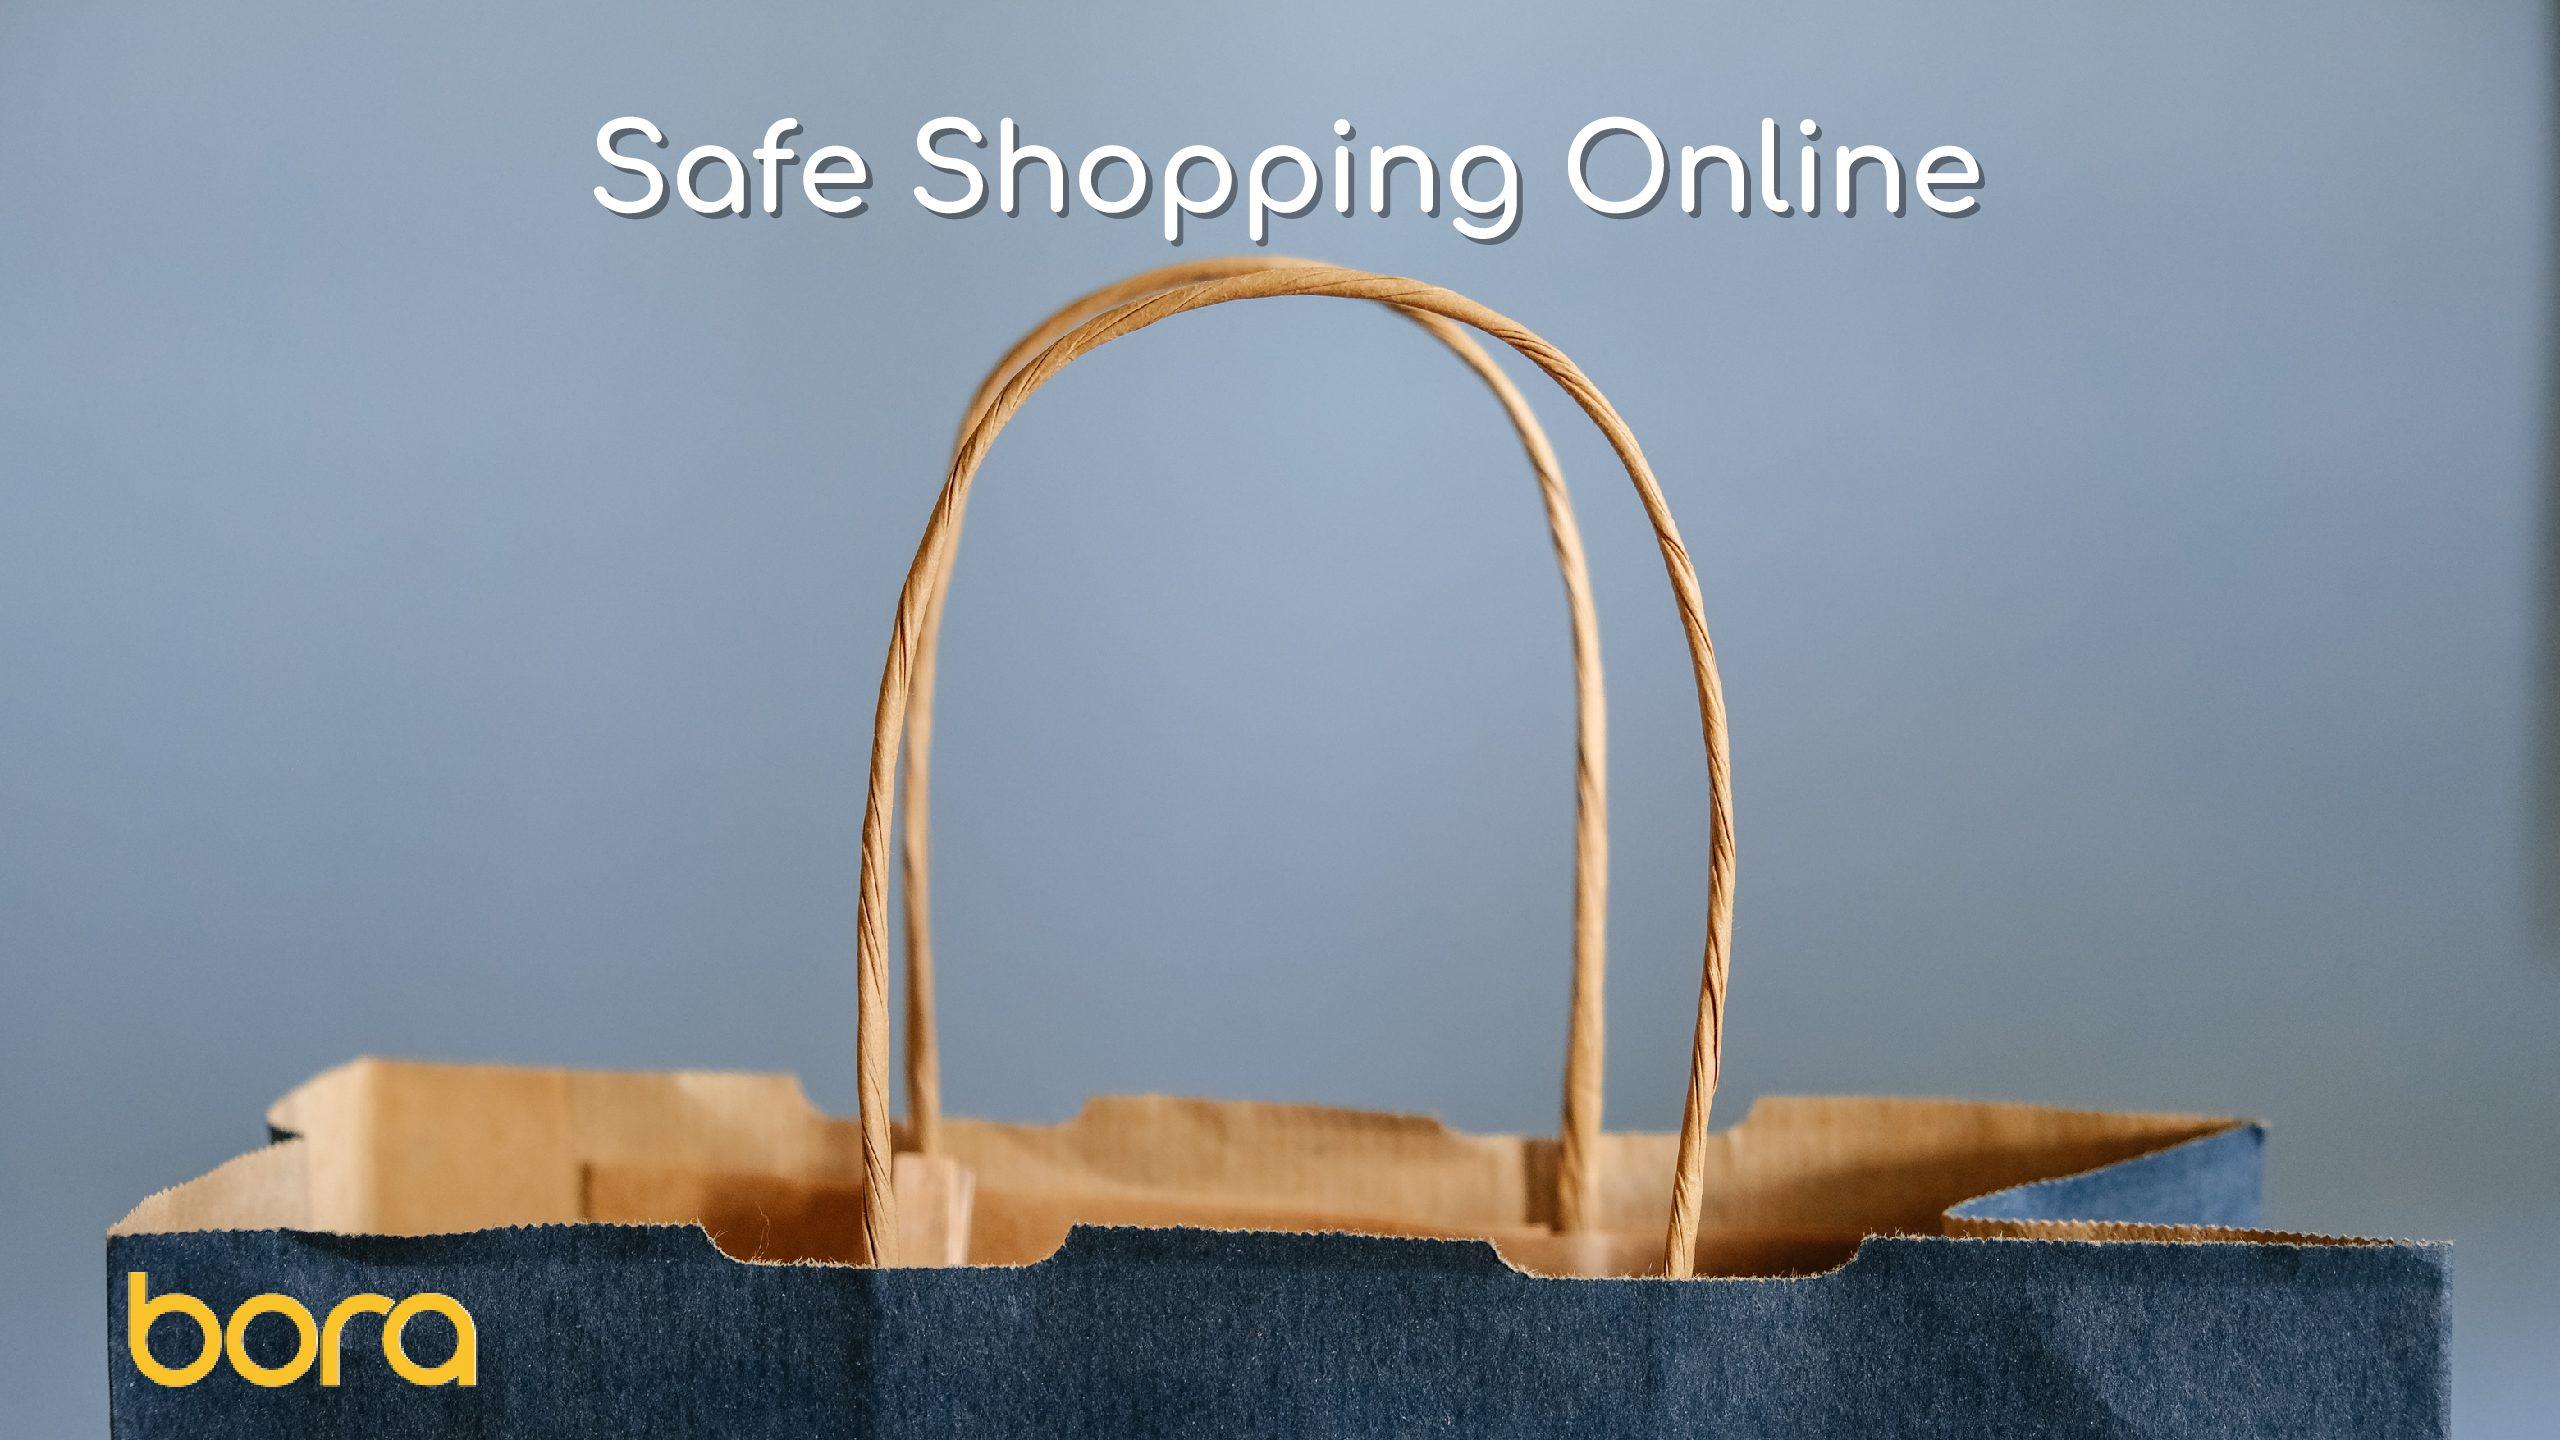 Safe Shopping Online